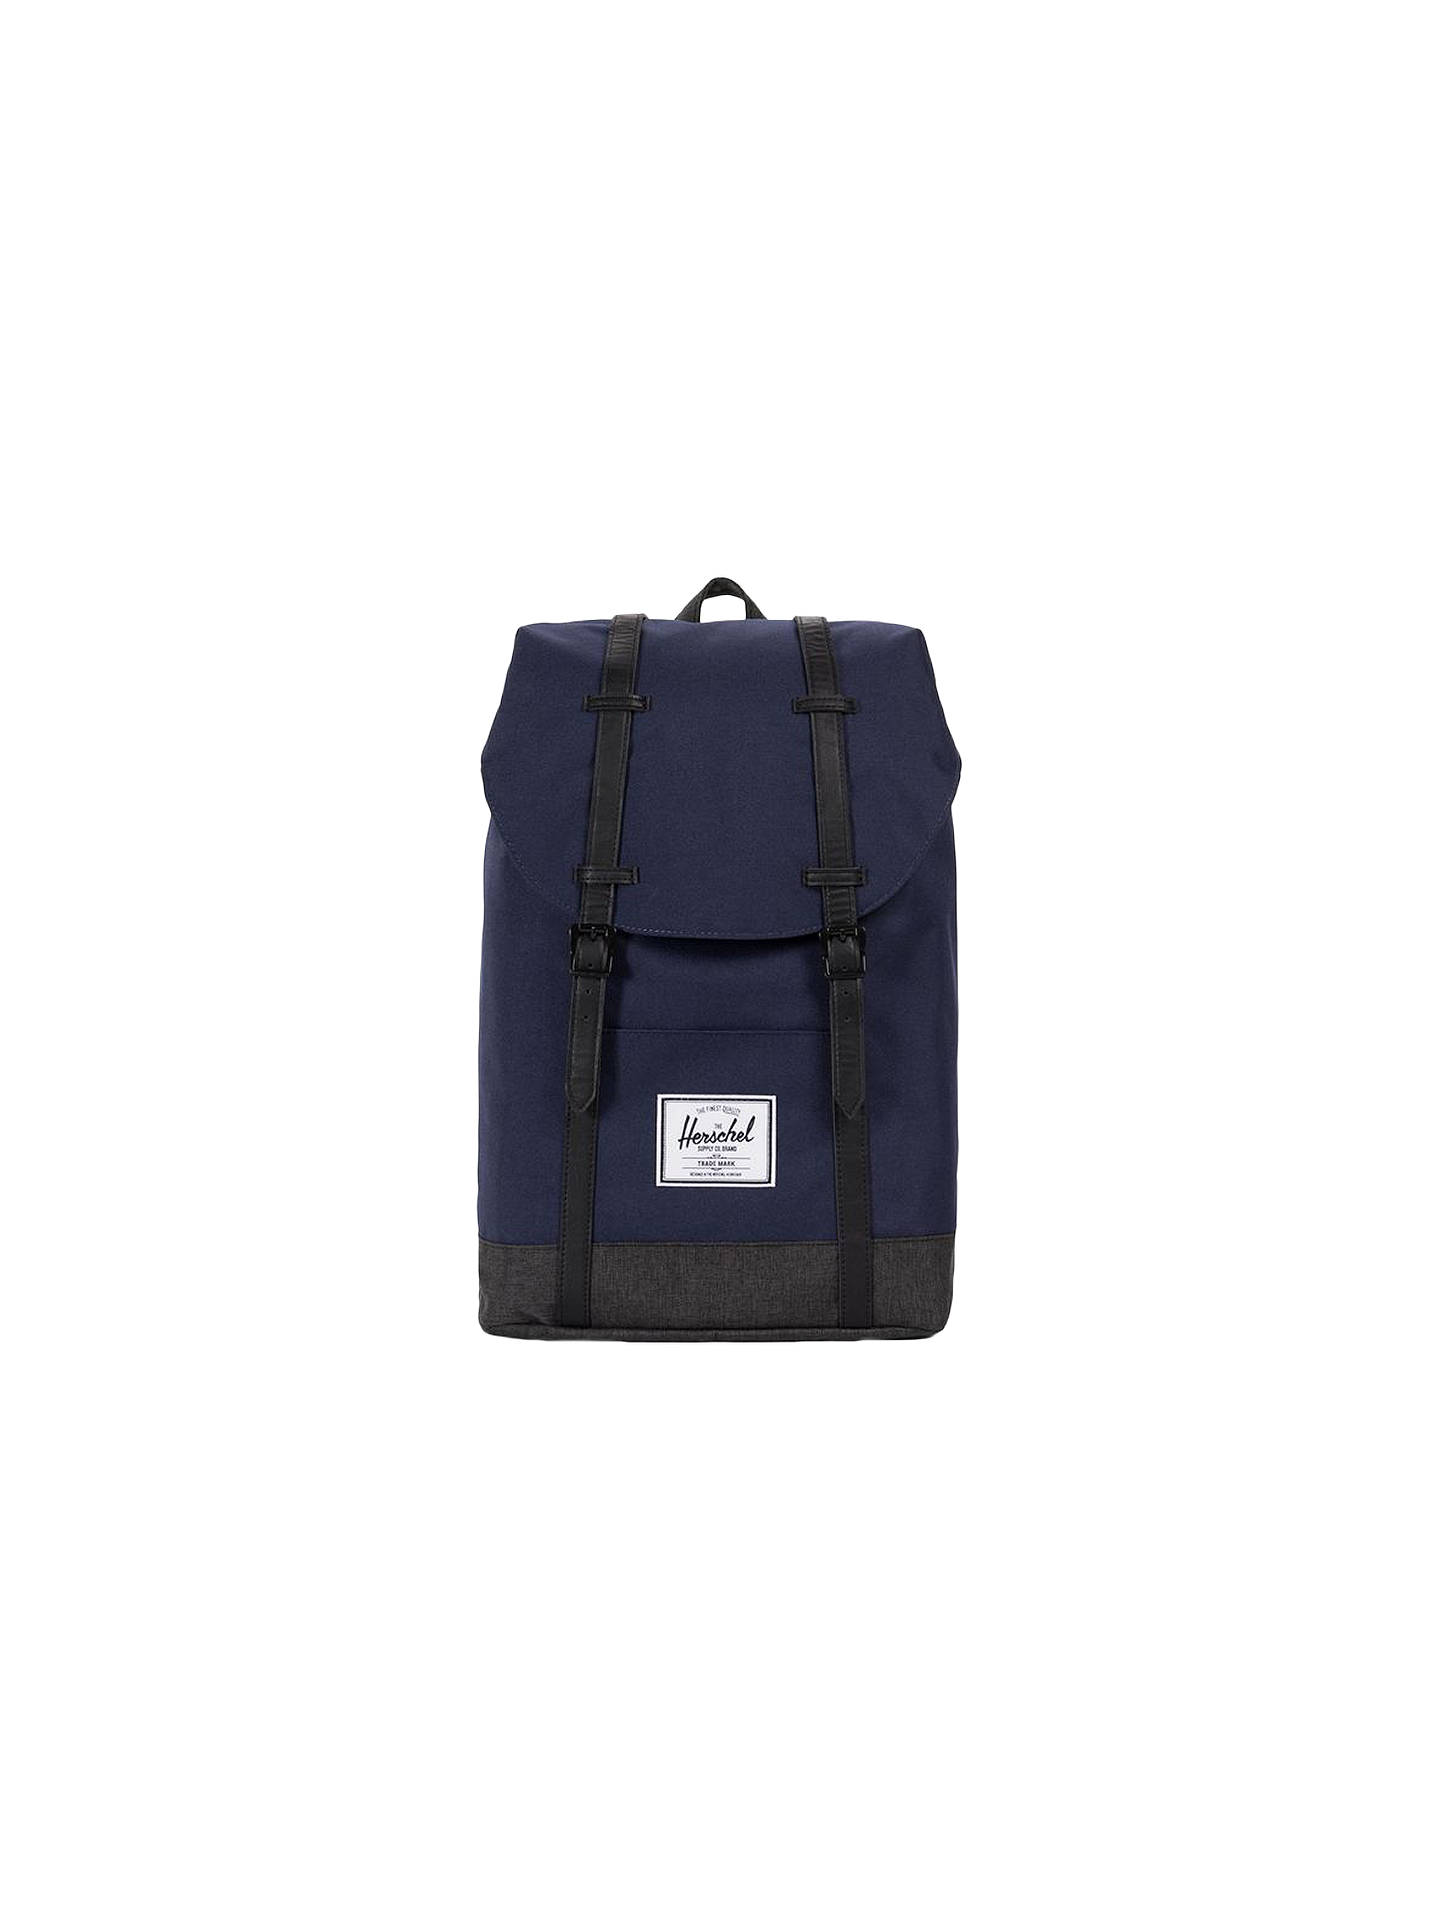 97bcc8f66ce Buy Herschel Supply Co. Retreat Backpack, Peacoat Blue/Denim Online at  johnlewis.